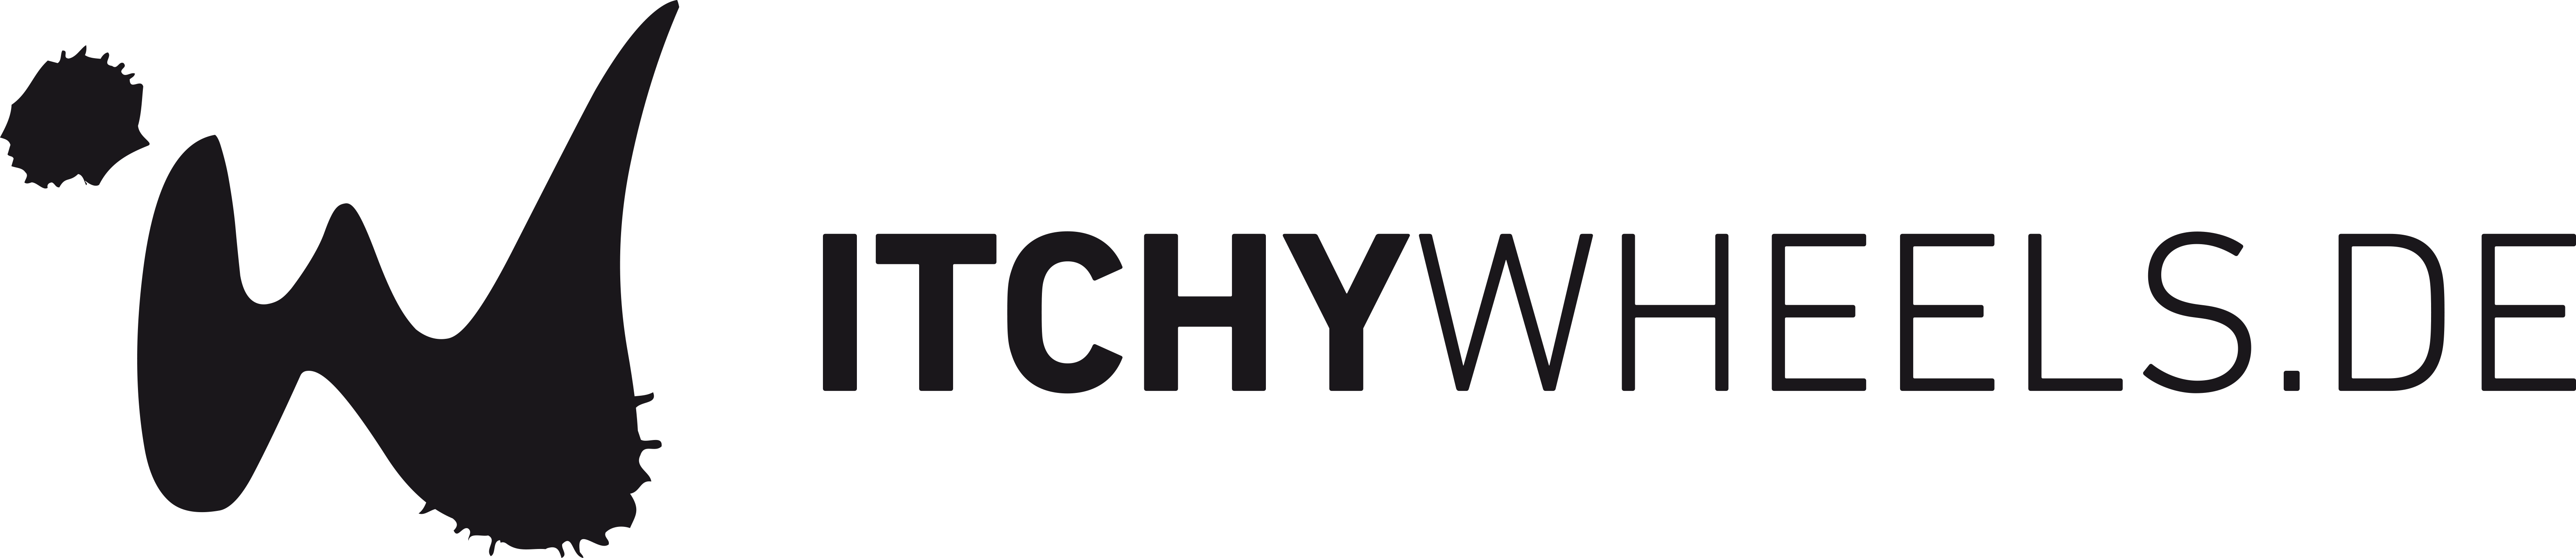 itchywheels - 4x4 Weltreise und Ausbau-Blog